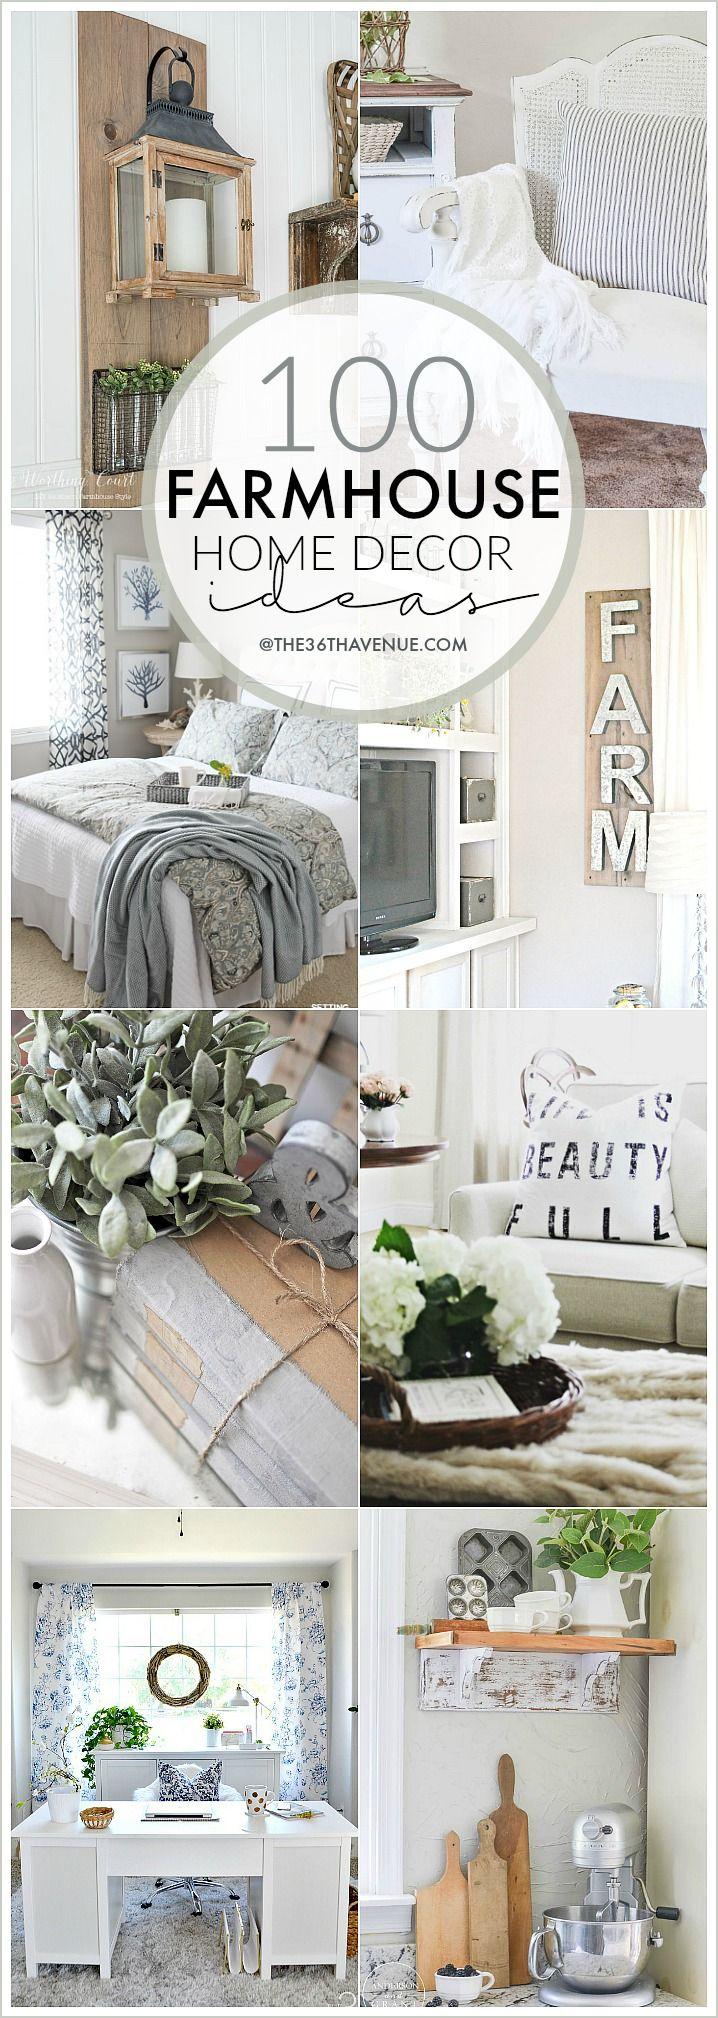 25 best ideas about farmhouse bedroom decor on pinterest